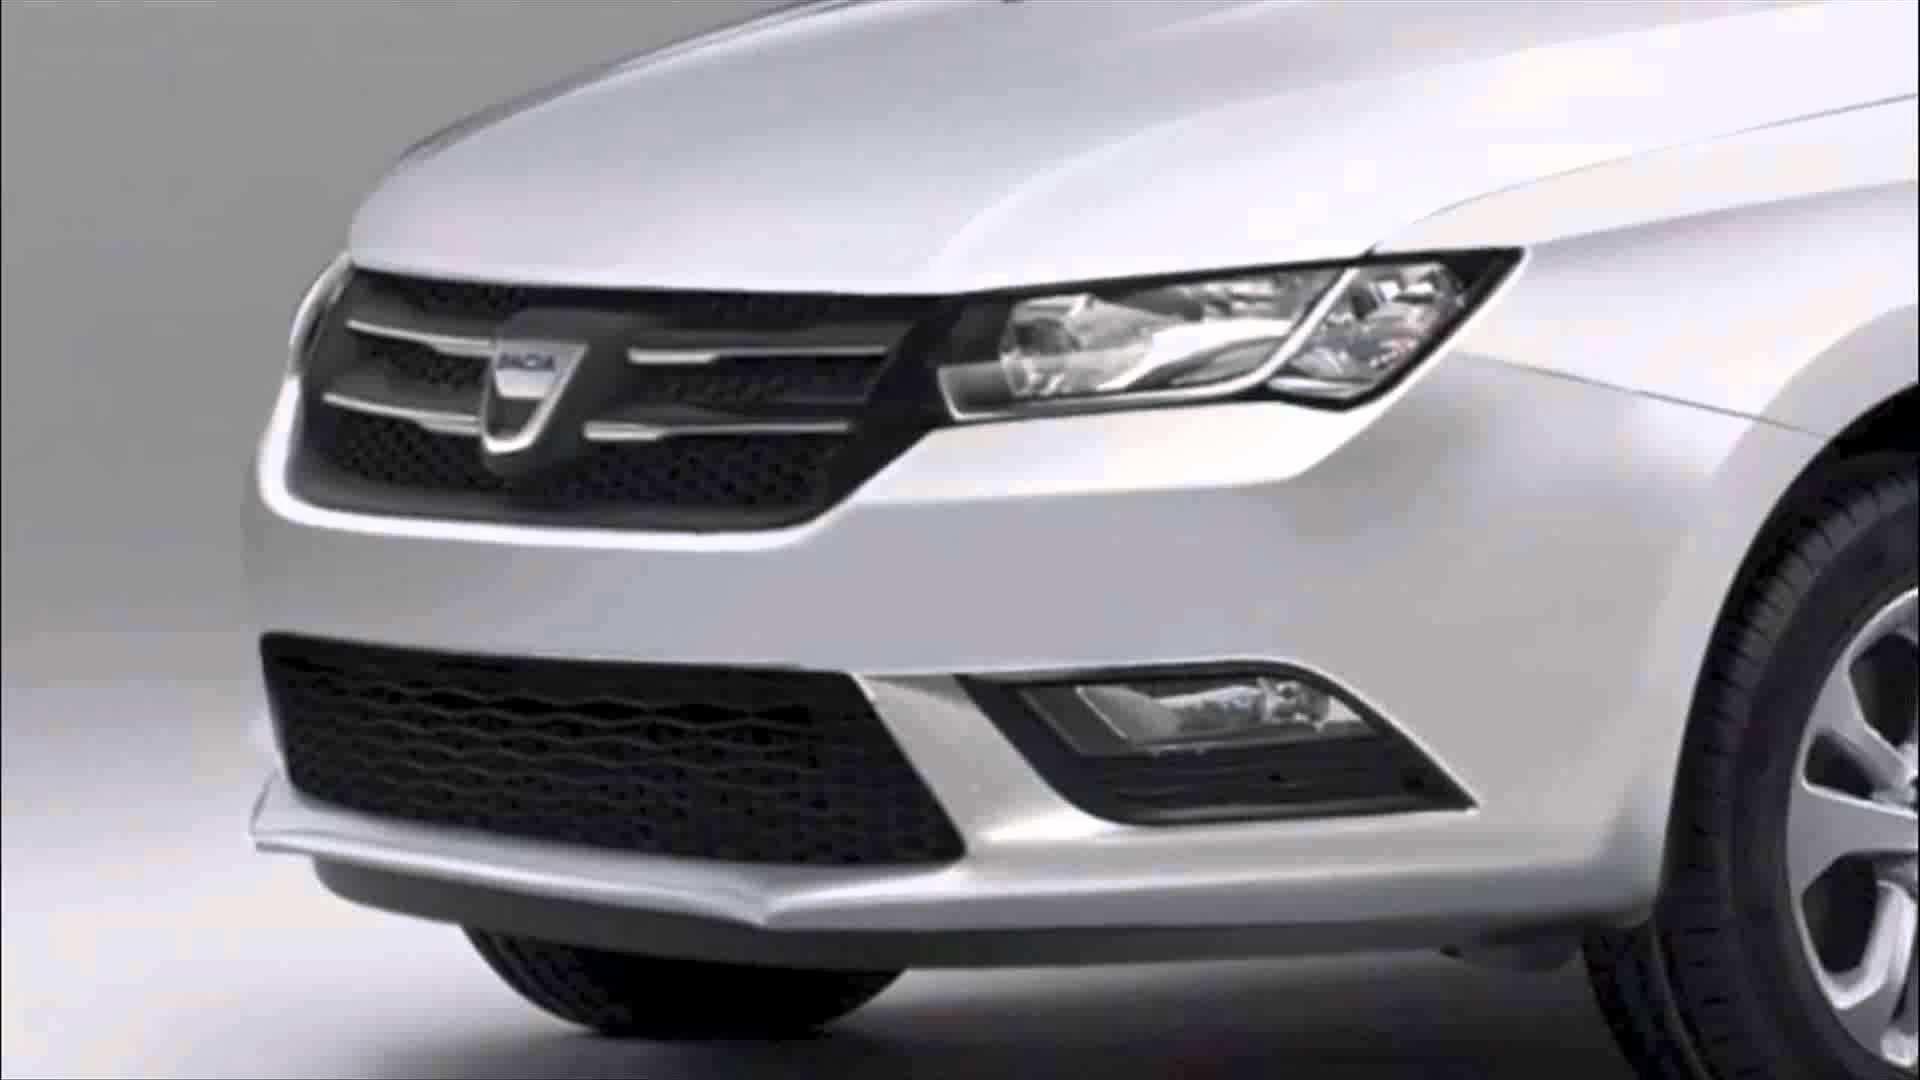 29 New Dacia Logan 2020 Reviews by Dacia Logan 2020